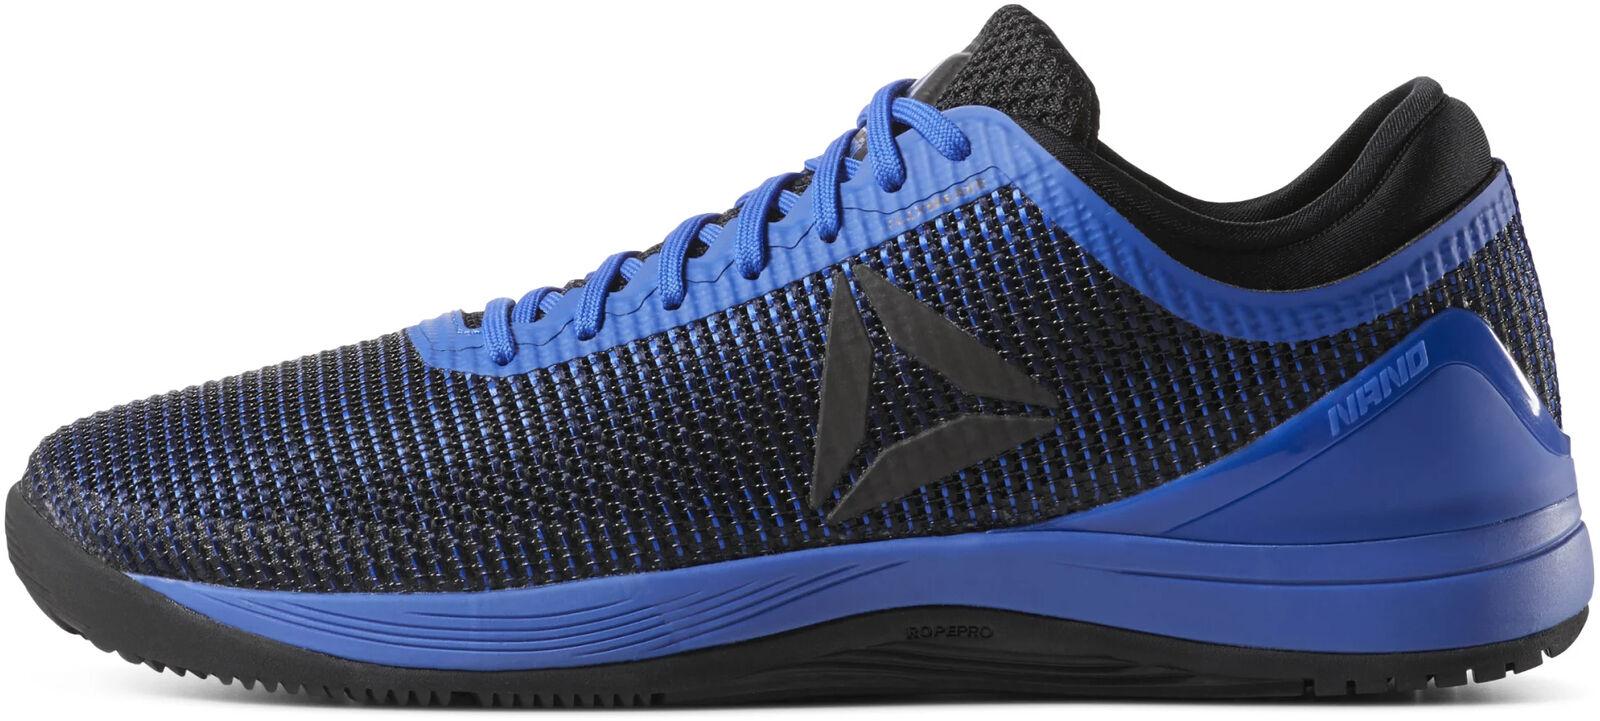 Reebok Crossfit Nano 8 Flexweave Mens Training shoes - bluee